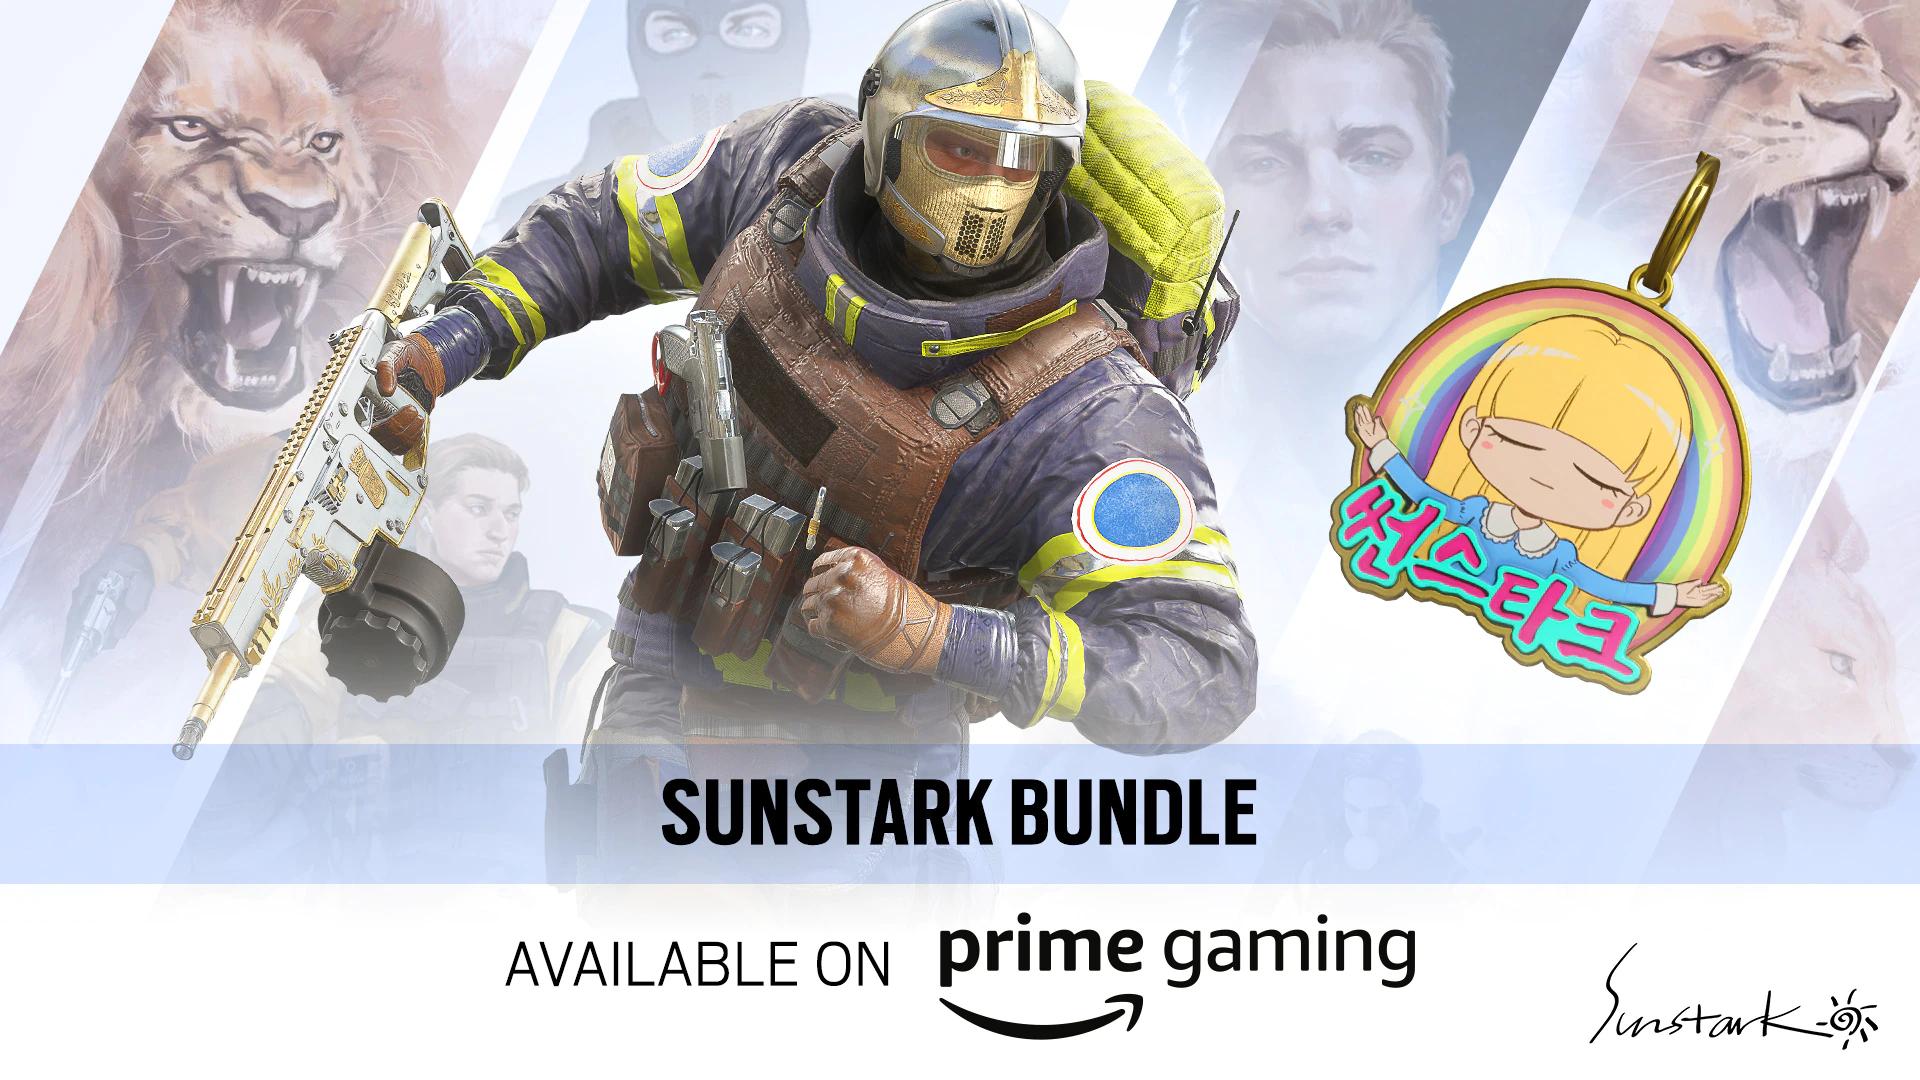 Sunstark Operator Bundle : Rainbow Six Siege (PC & Console) Free @ Amazon Gaming via Ubisoft Store